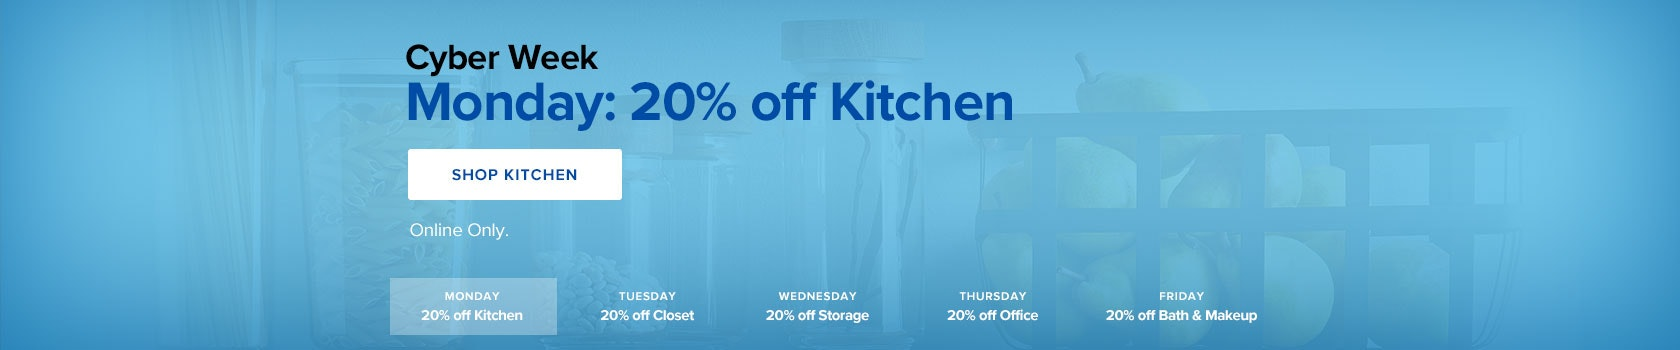 Cyber Week: Monday - 20% off Kitchen